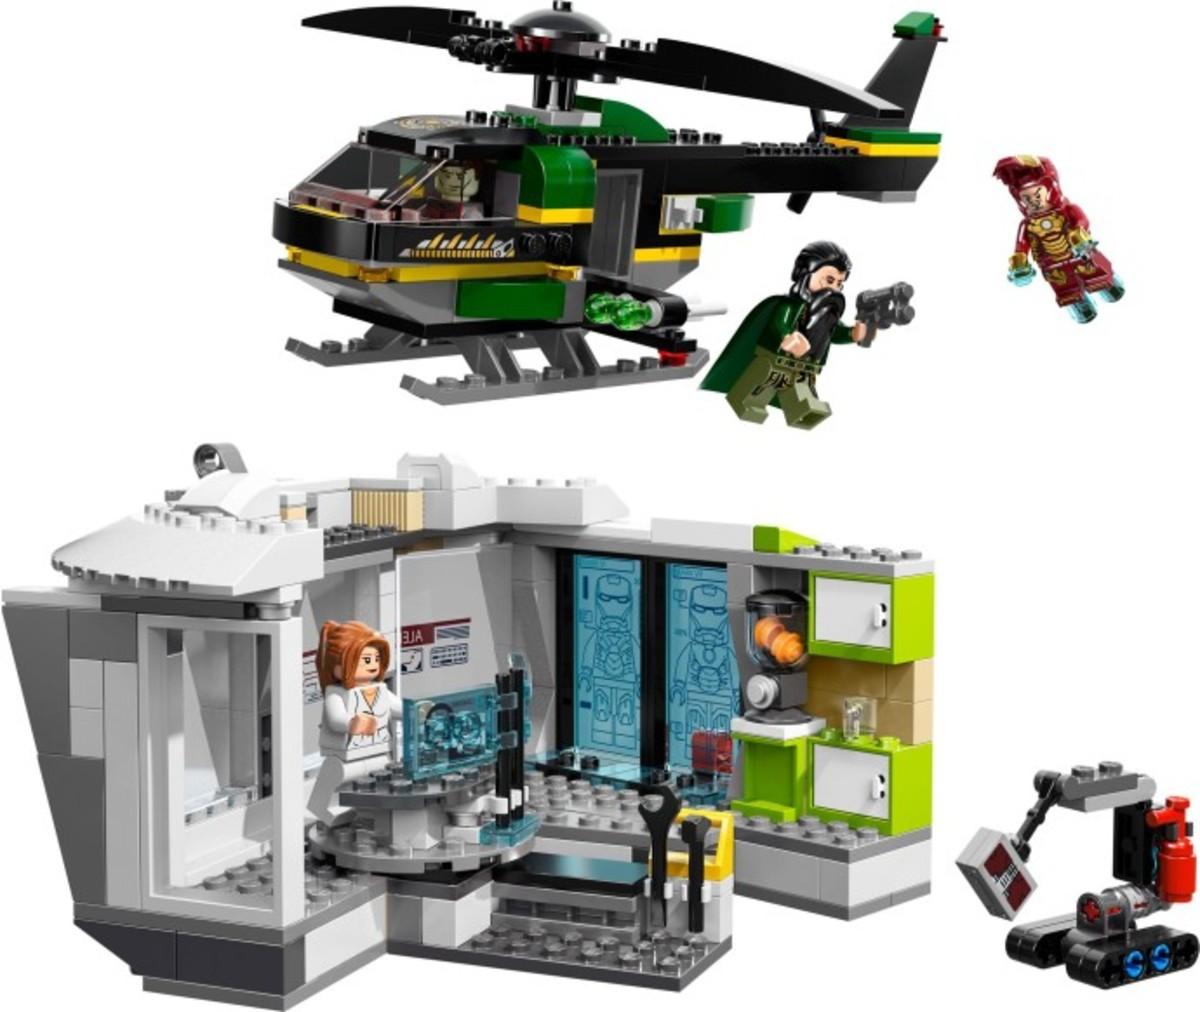 LEGO Super Heroes Iron Man: Malibu Mansion Attack 76007 Assembled